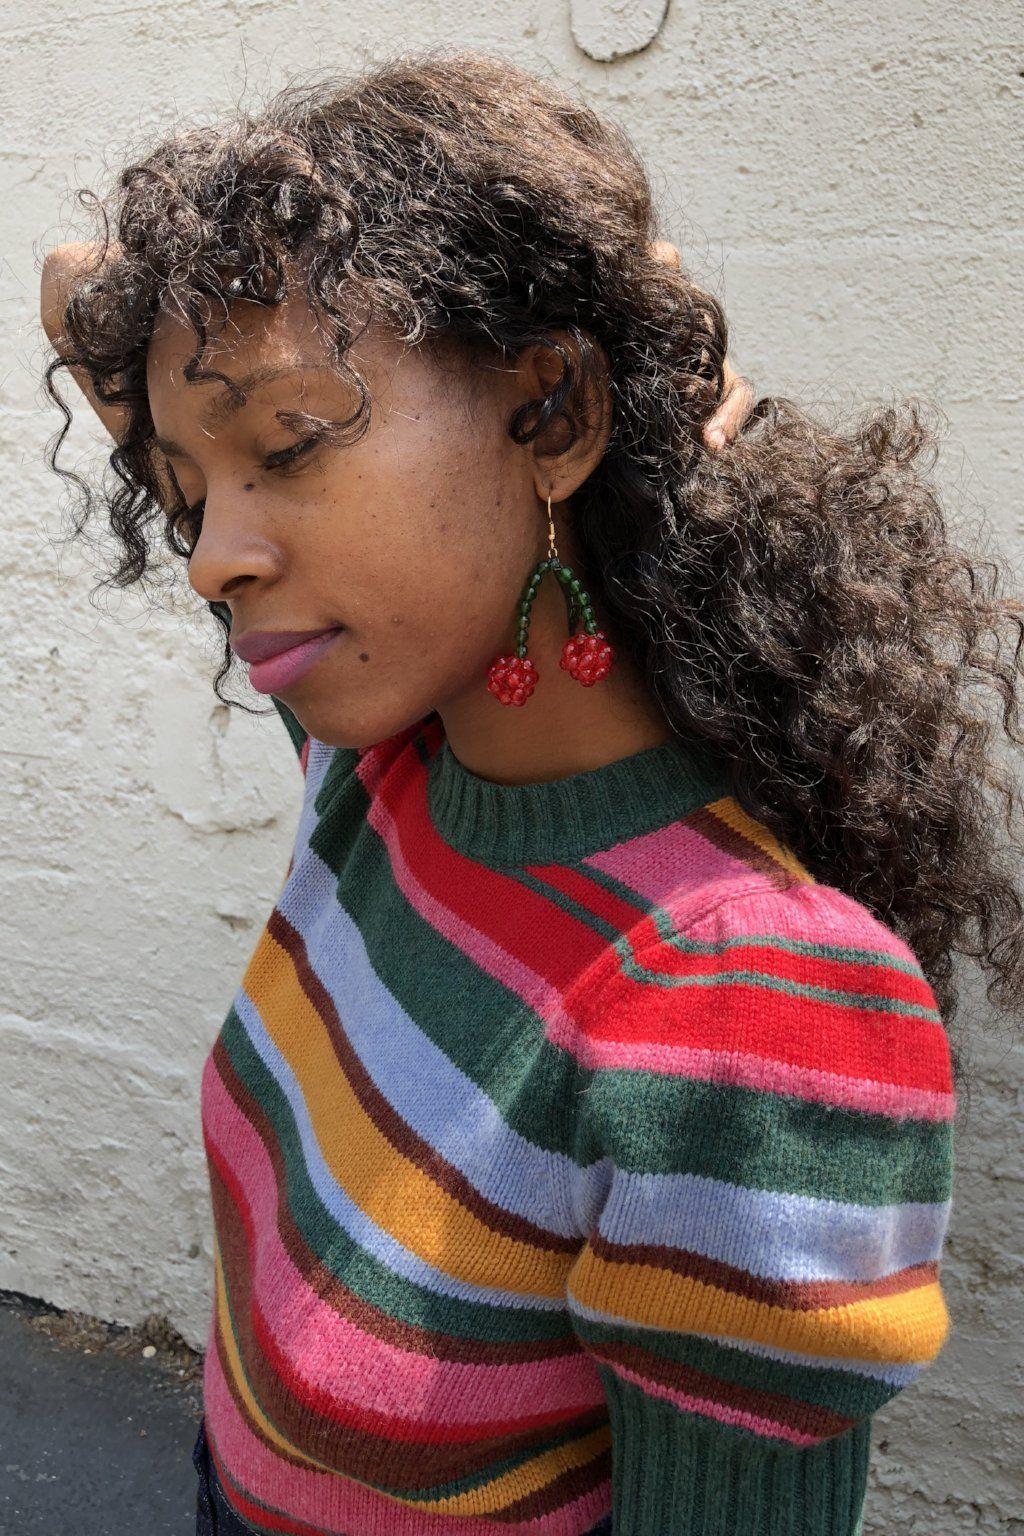 a6fb97fe49fa2 Lolita Earrings - Red Cherry   SHOP   LISA SAYS GAH   Earrings ...